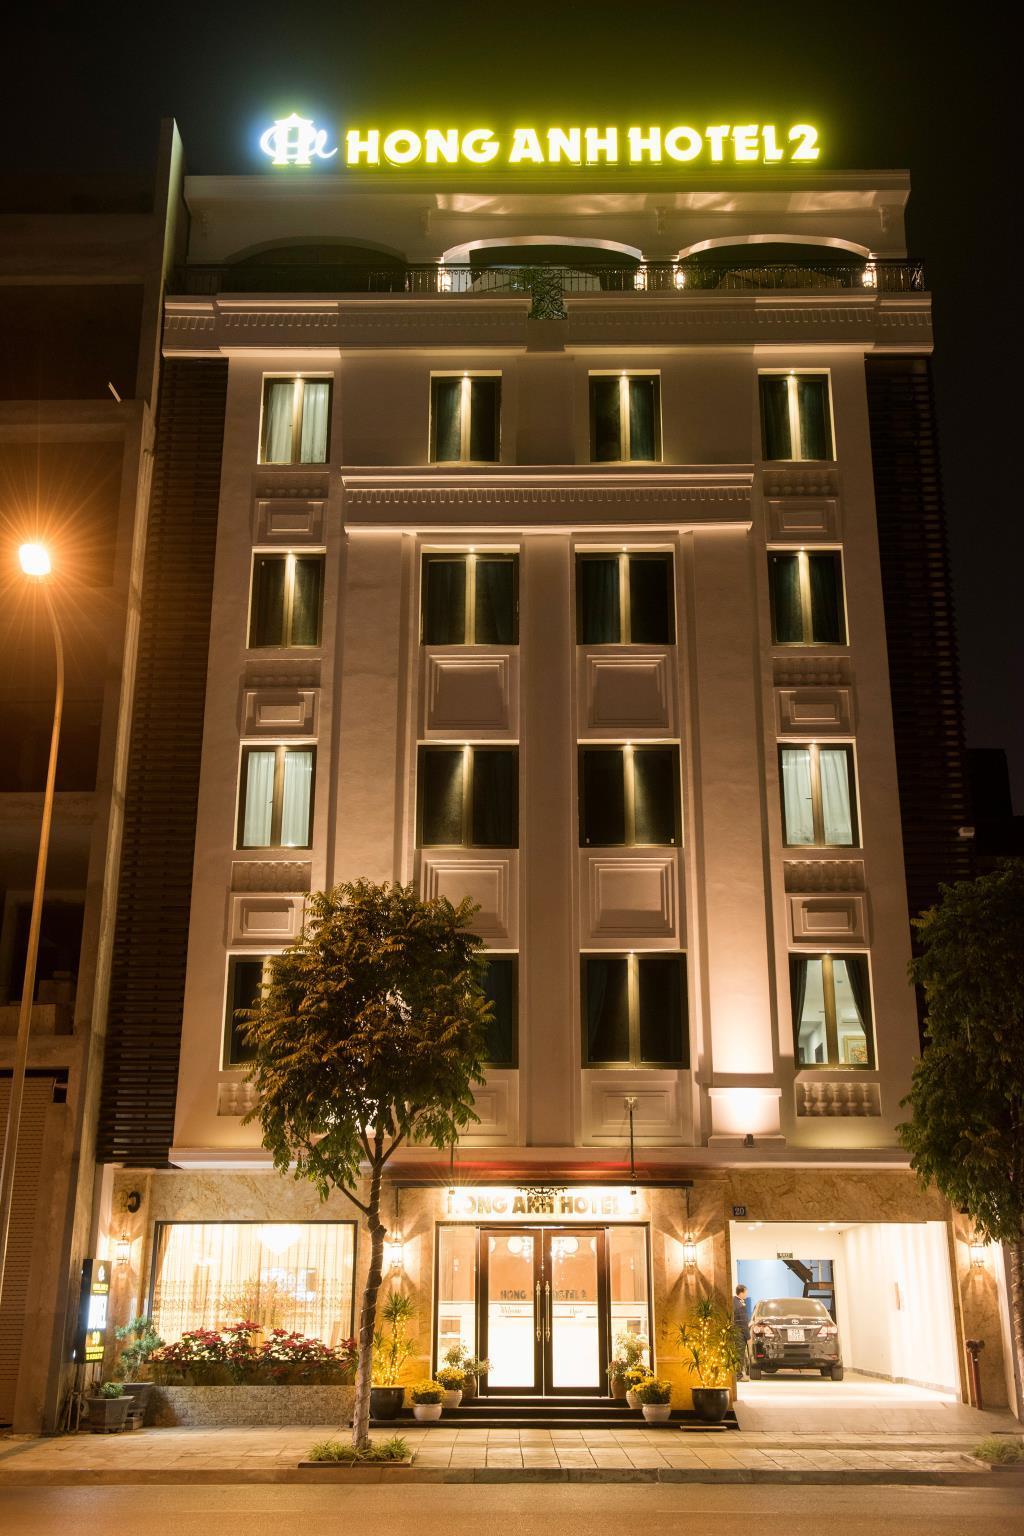 Hong Anh Hotel 2, Cầu Giấy